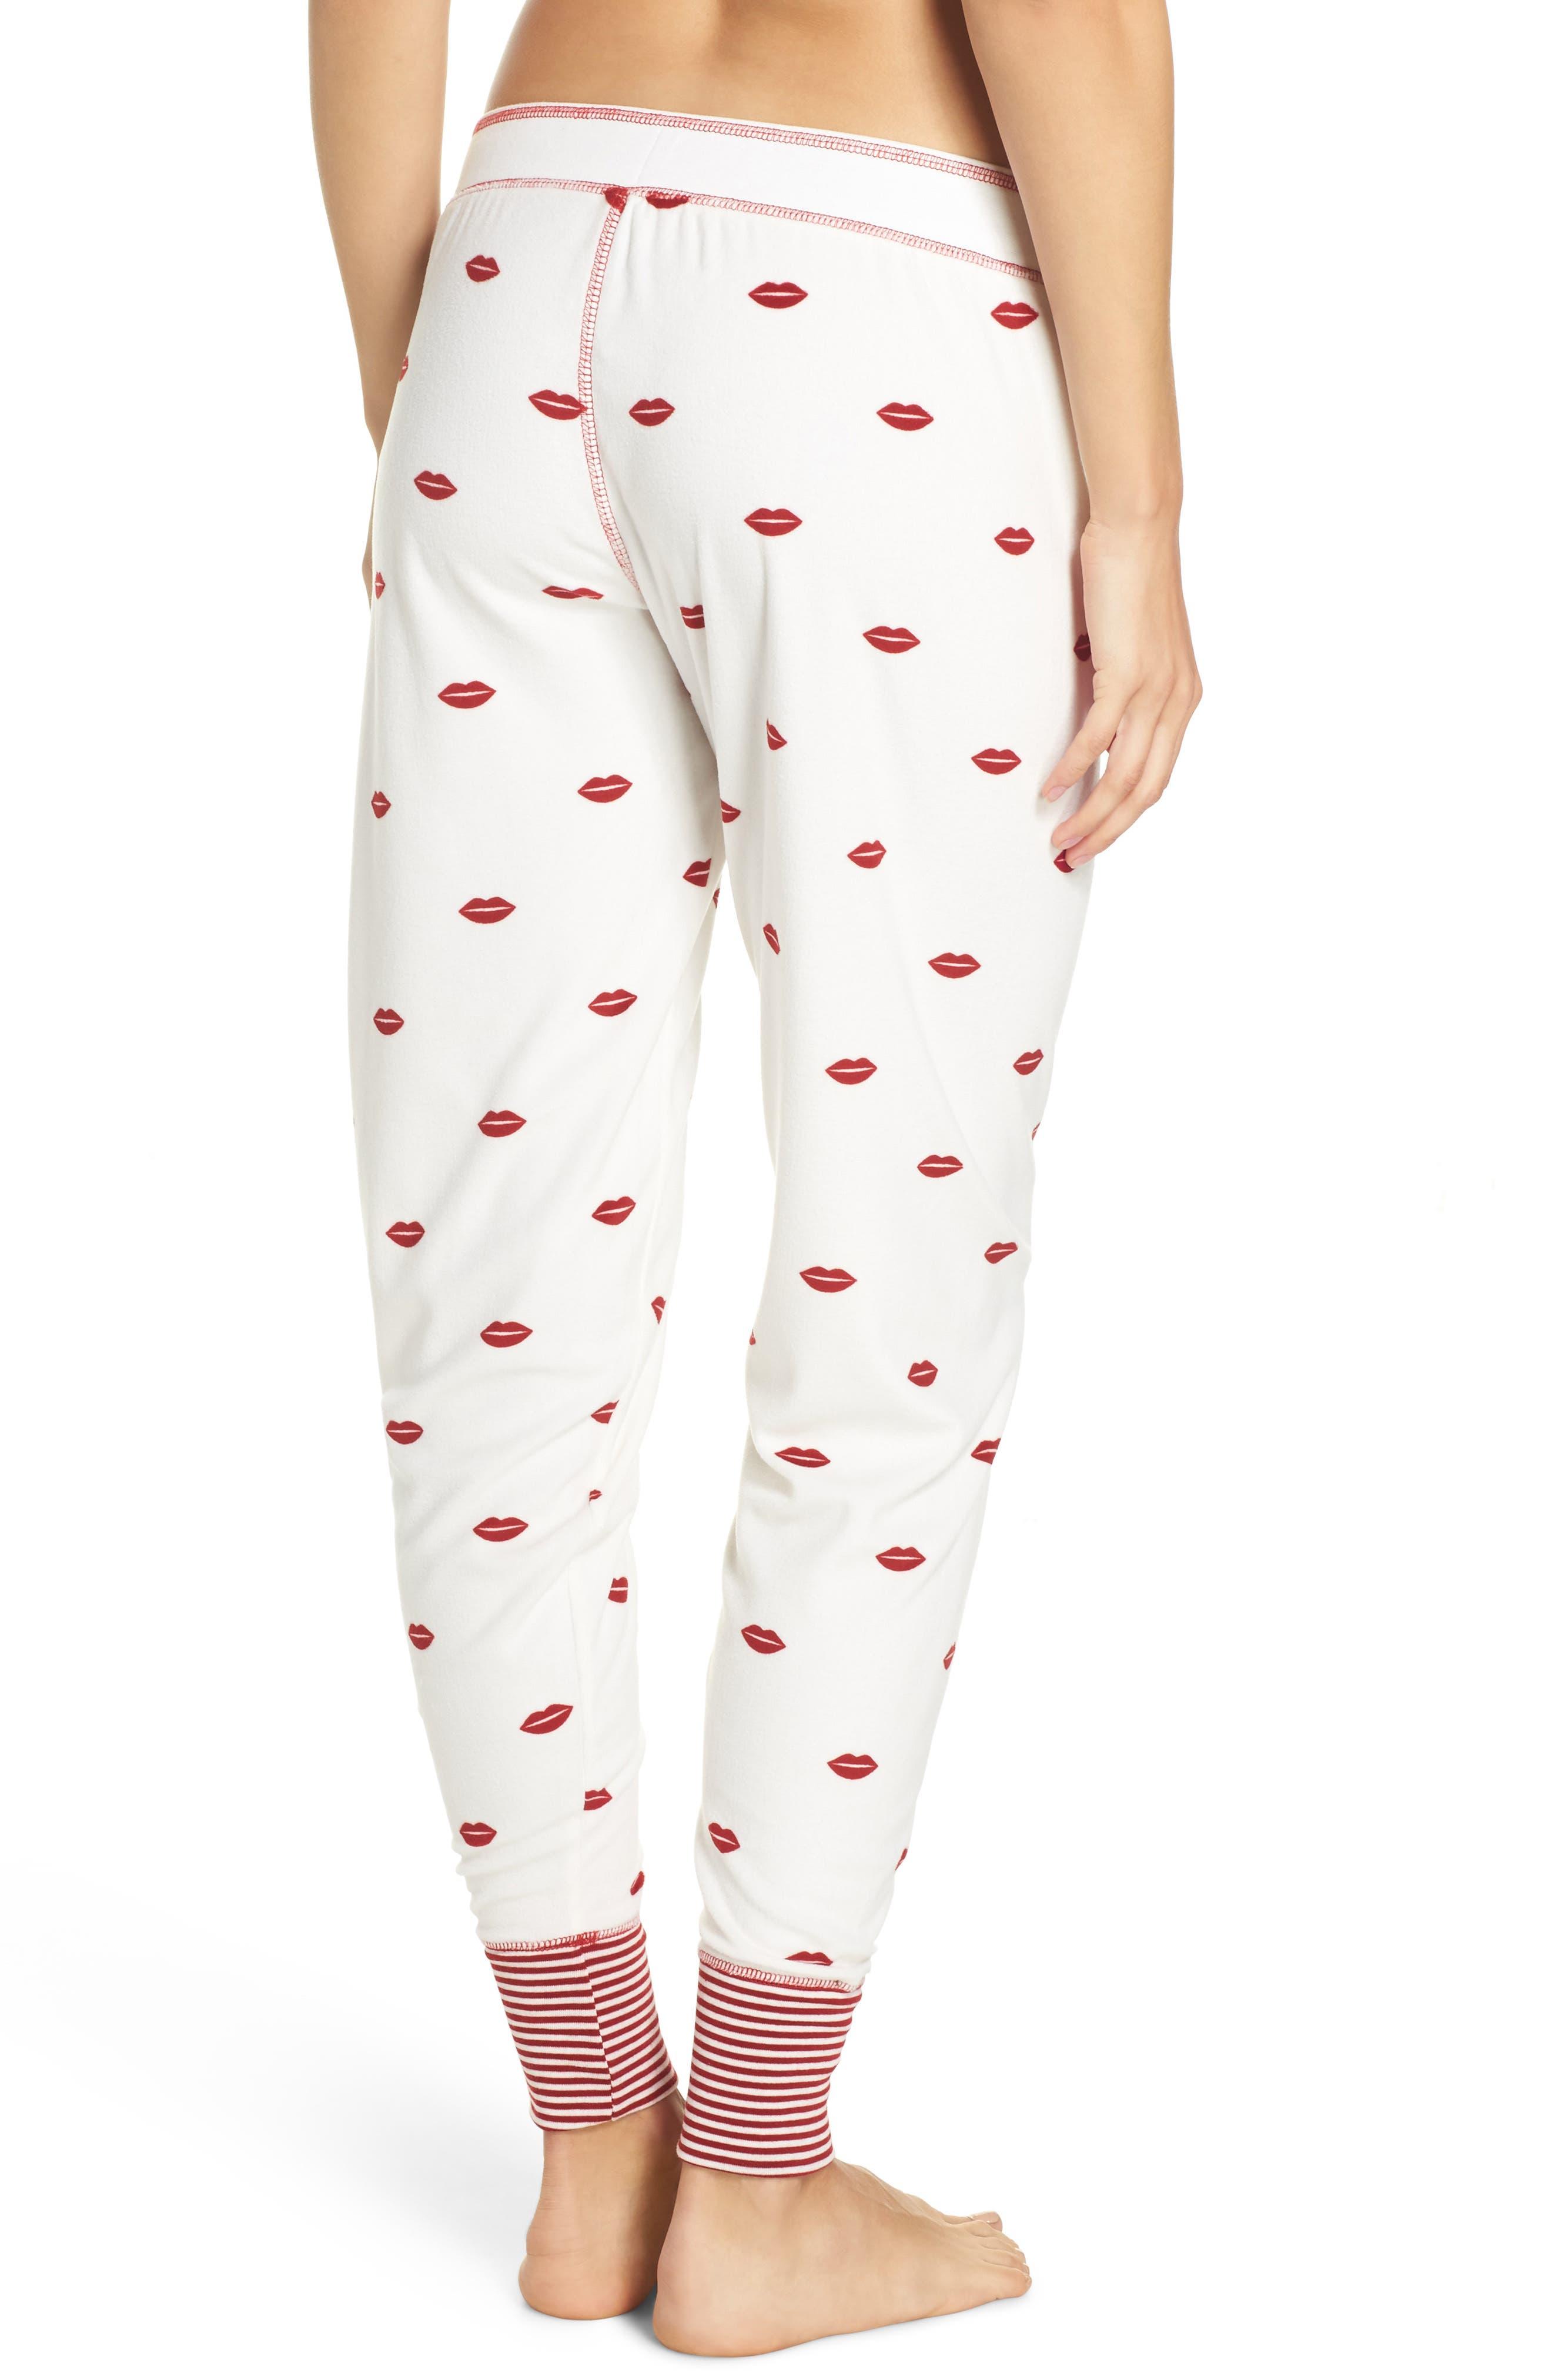 PJ SALVAGE, Lip Print Pajama Pants, Alternate thumbnail 2, color, 900